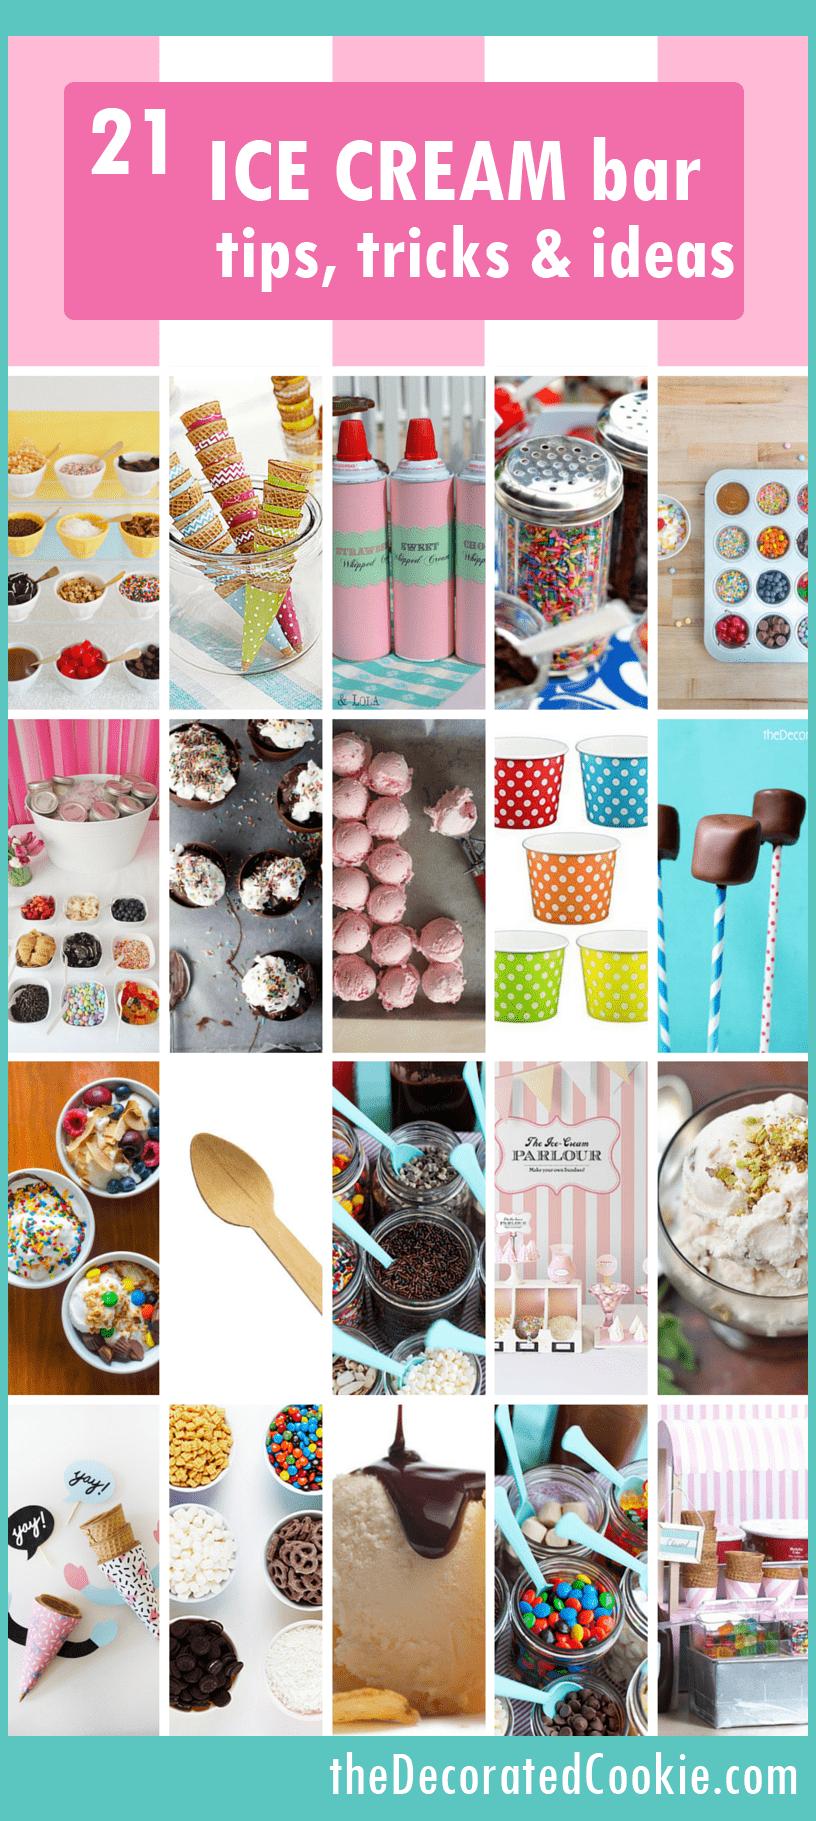 Ice cream sundae bar: Ideas, topping ideas, and recipes: Summer party.